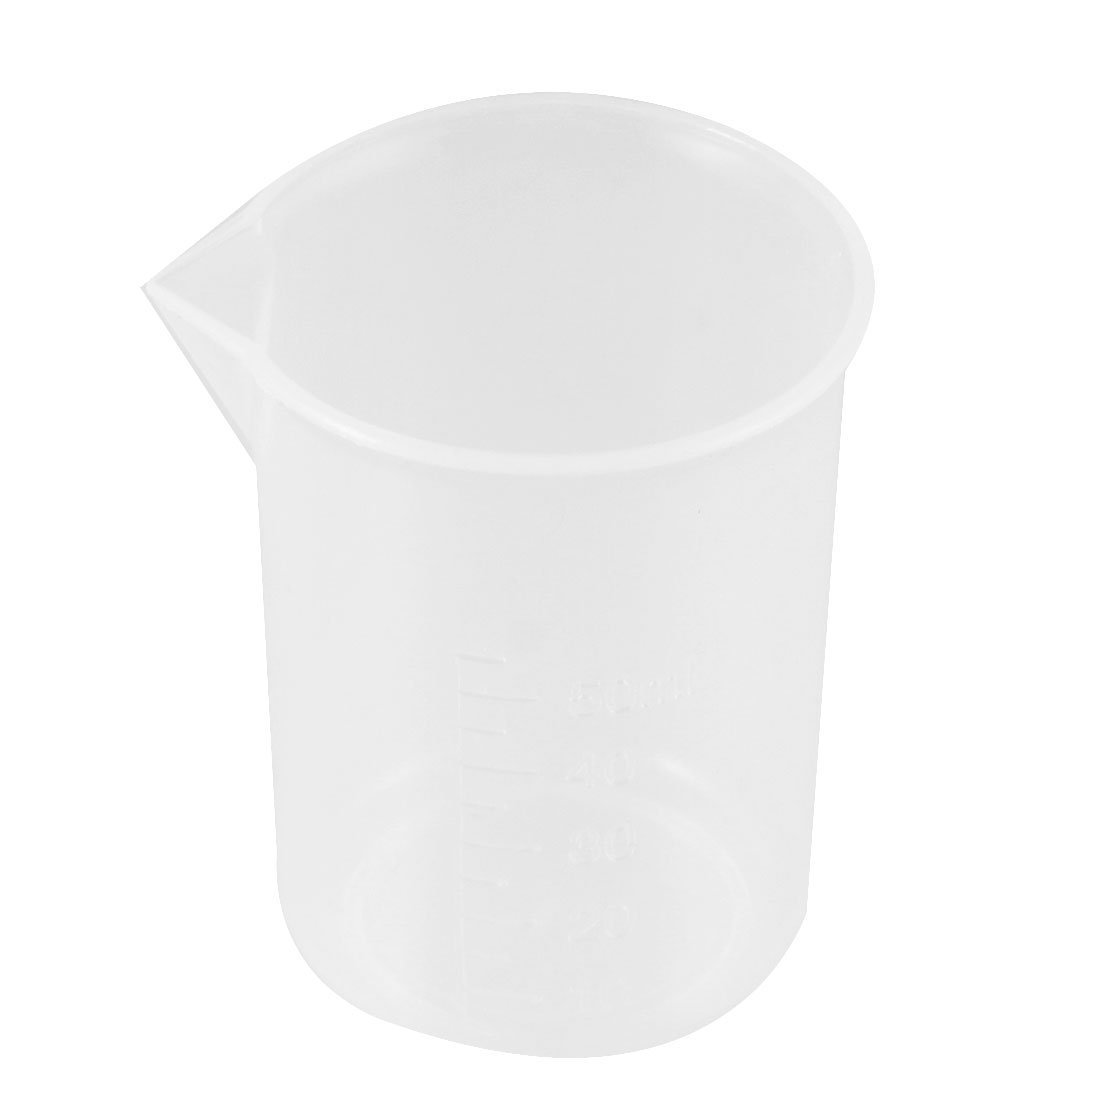 50mL Capacity Transparent Measuring Cup Beaker Laboratory Set Sourcingmap US-SA-AJD-19180